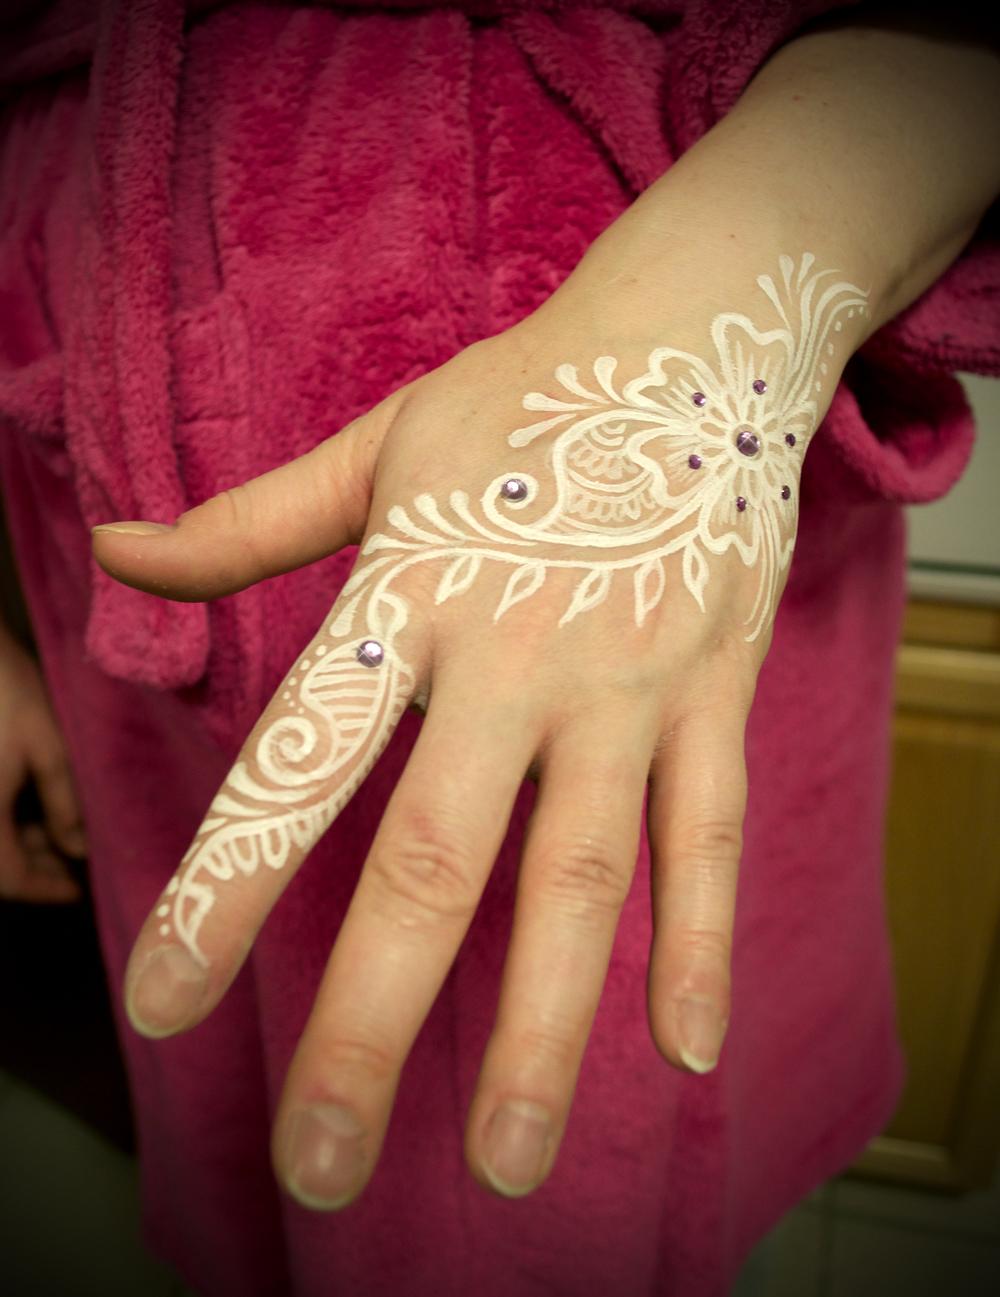 b1ba28d75 Temporary Tattoos — Cleveland Henna - HennaMe Body Art